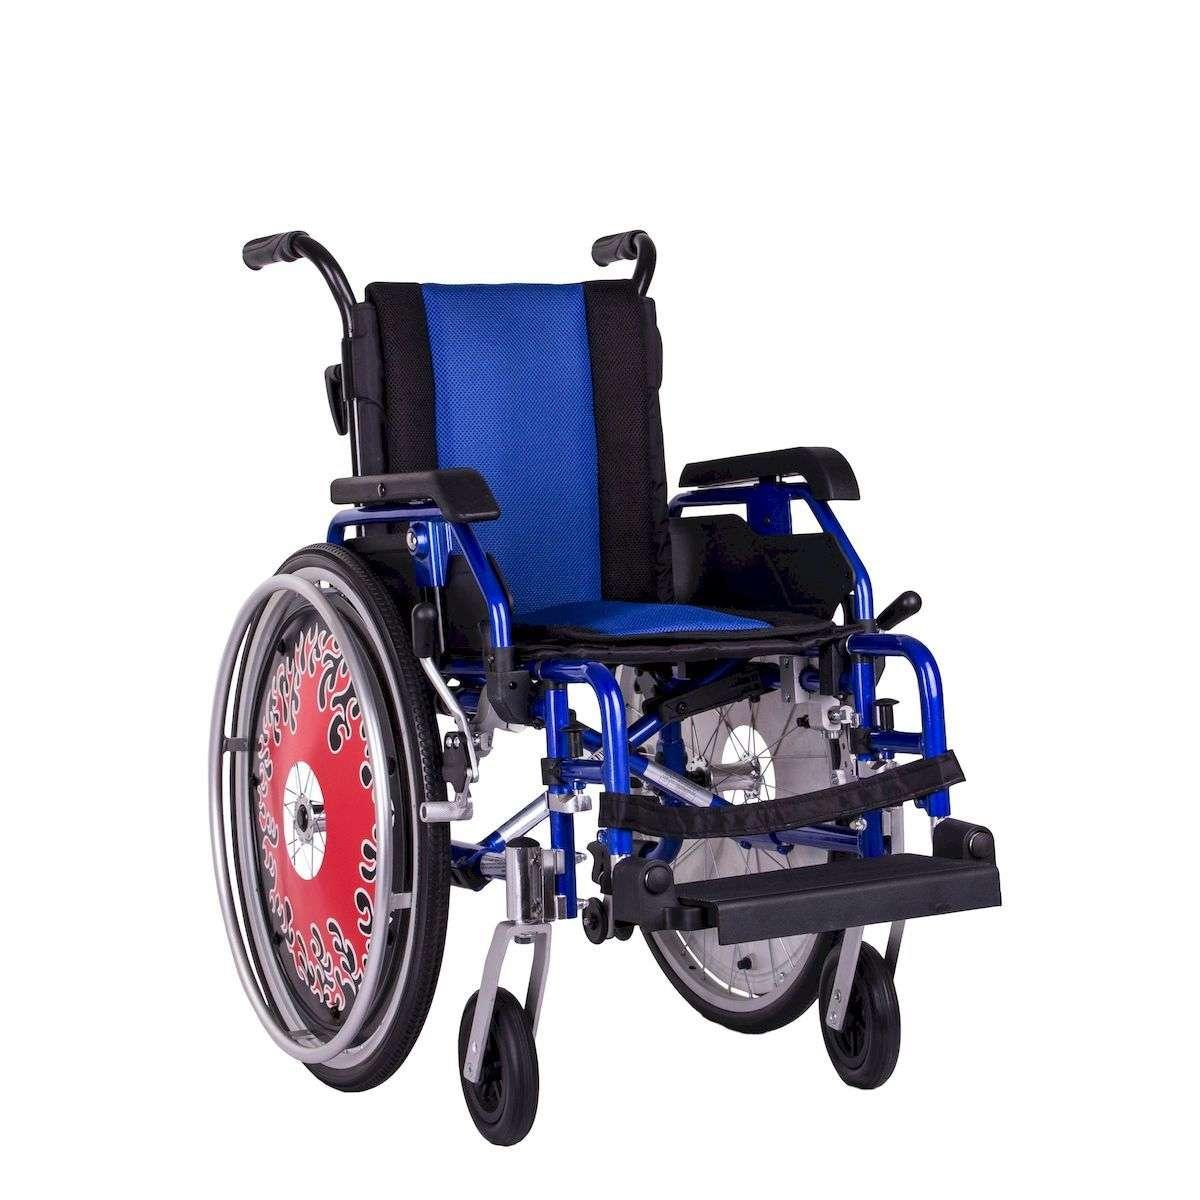 Стандартная инвалидная коляска для детей, OSD Child Chair